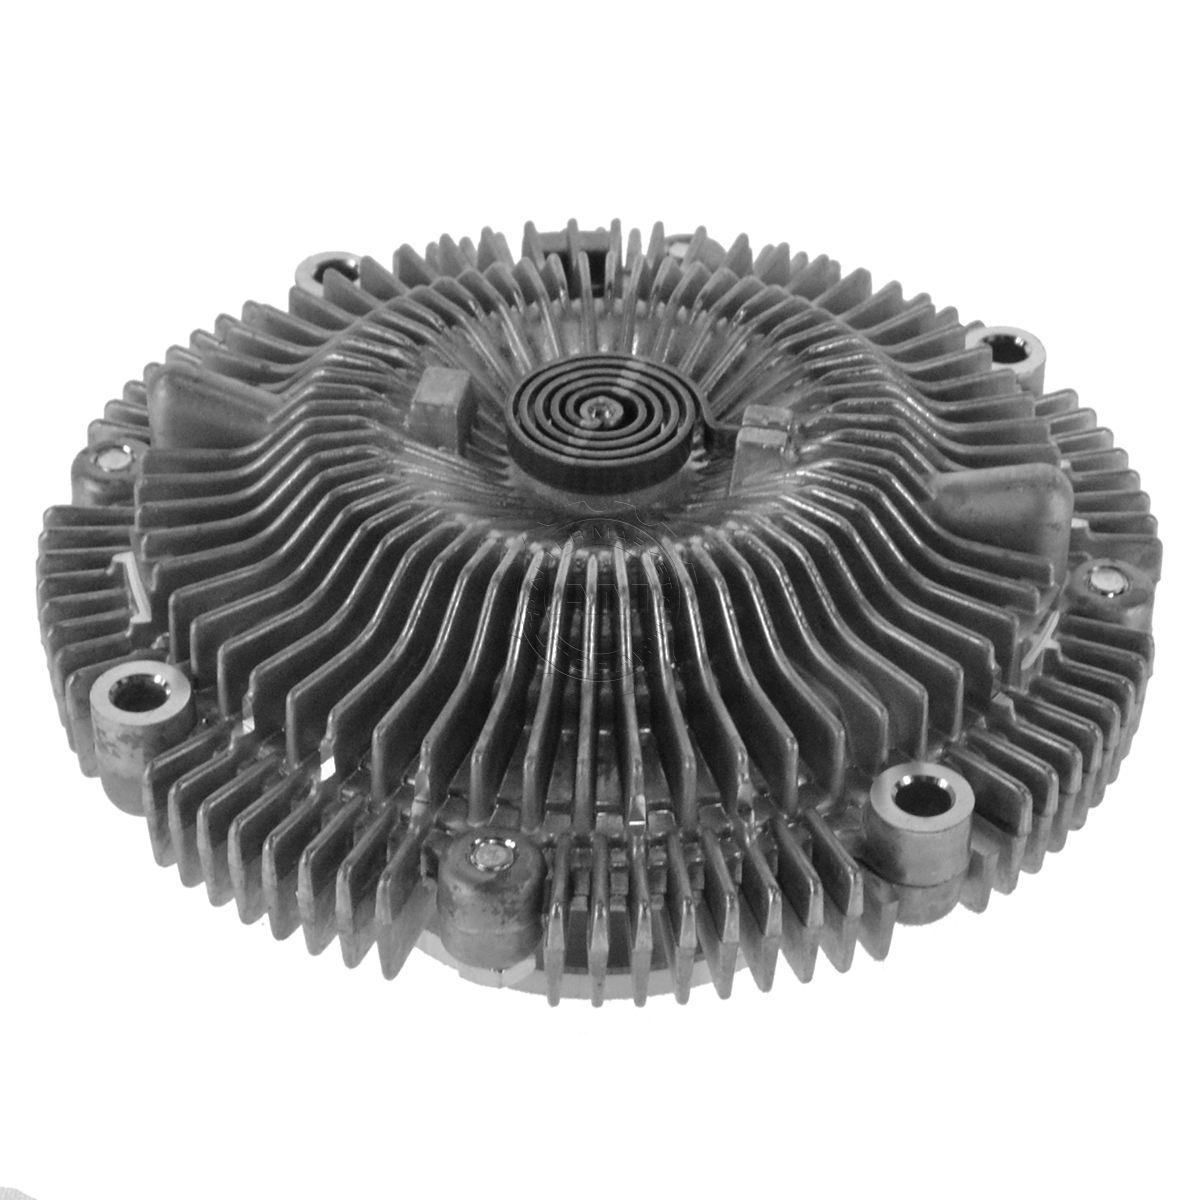 hight resolution of radiator cooling fan clutch for nissan frontier xterra pathfinder infiniti qx4